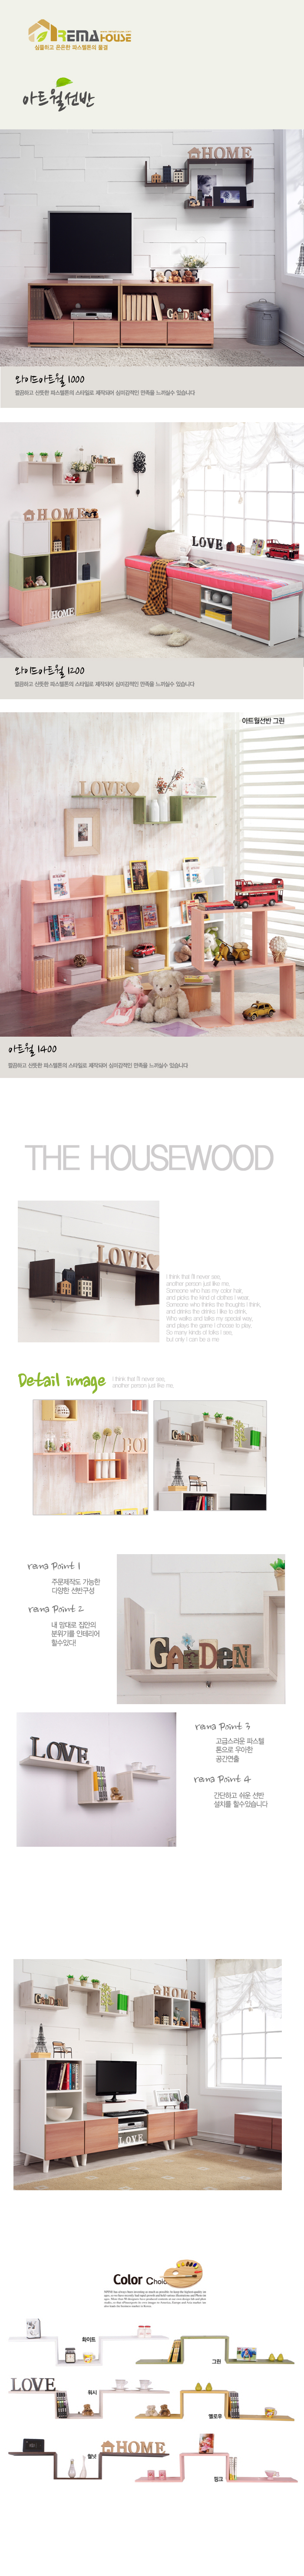 wall photo design